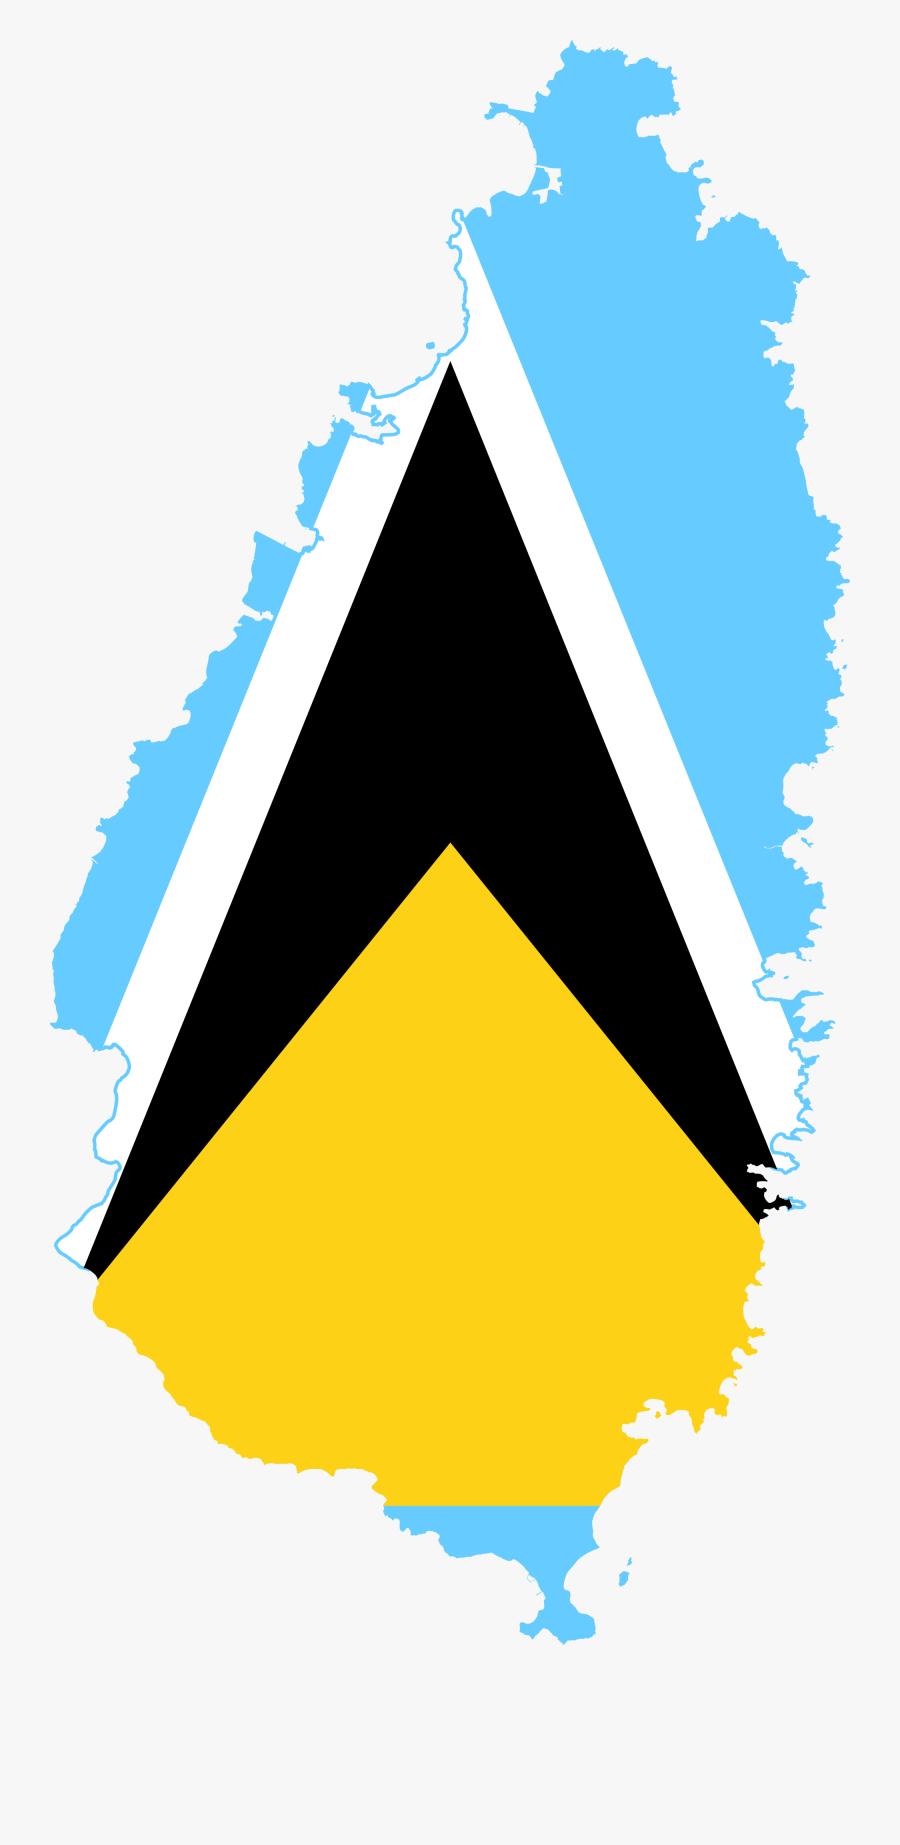 Clip Art Saint Lucia Picture - St Lucia Flag In Map, Transparent Clipart